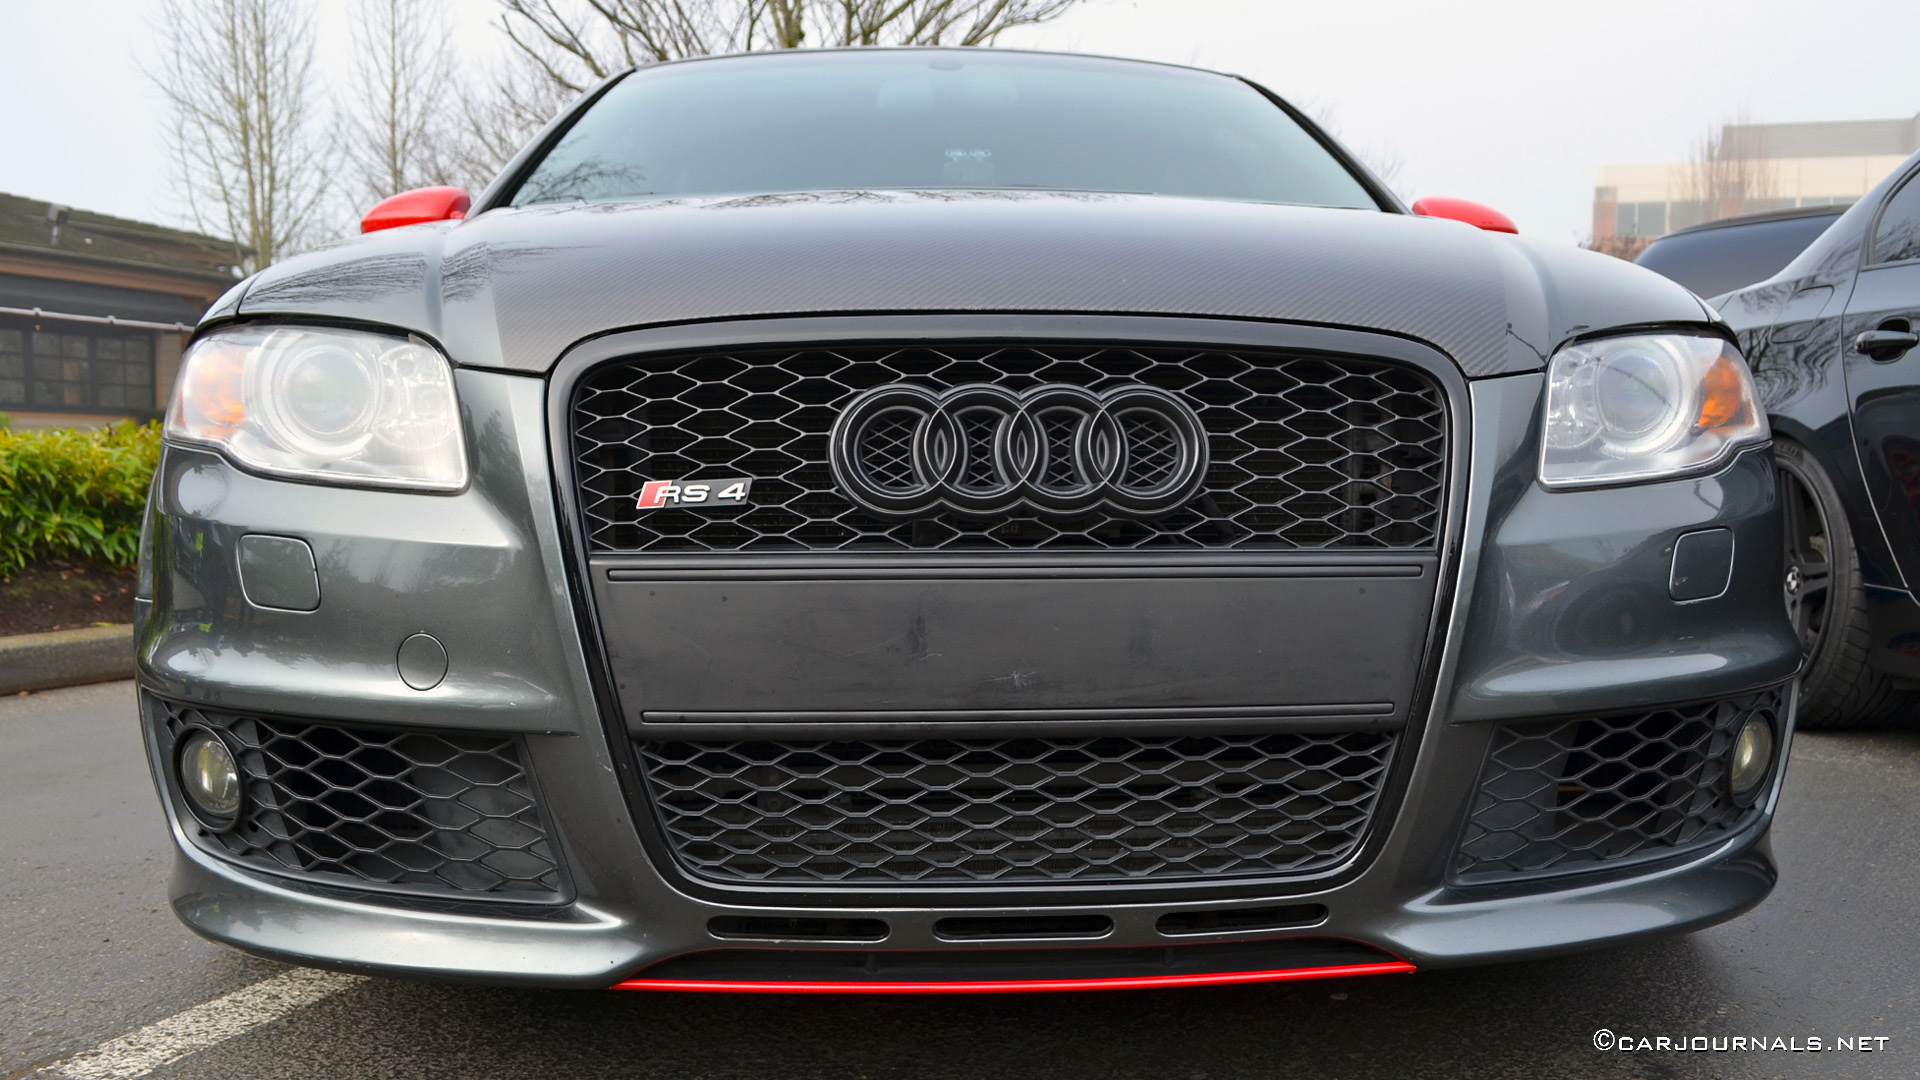 HD Car Wallpapers - Audi RS4 - Car journals